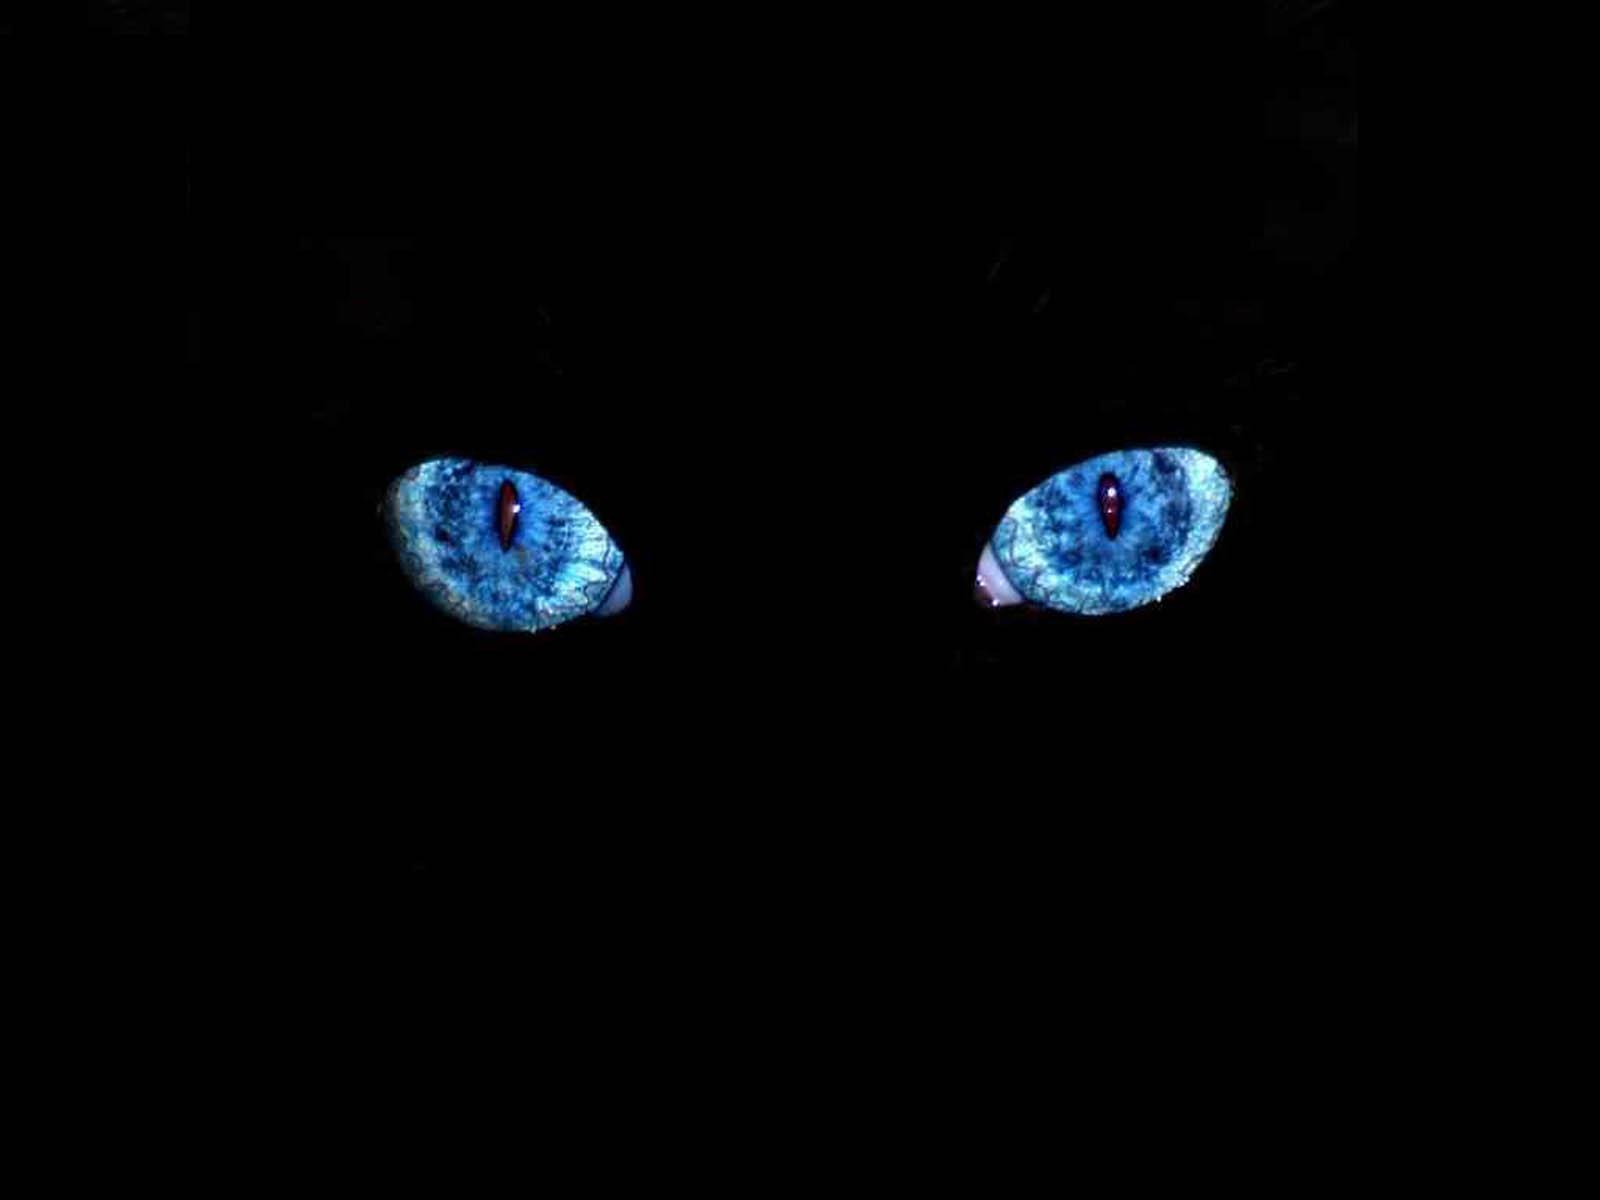 Blue Eyes Wallpaper likewise Black Wood Hd Wallpaper besides Lamborghini Screensaver Wallpaper additionally Sugar Skull  puter Wallpaper moreover 3d Windows Wallpaper Desktop Background. on best iphone wallpapers